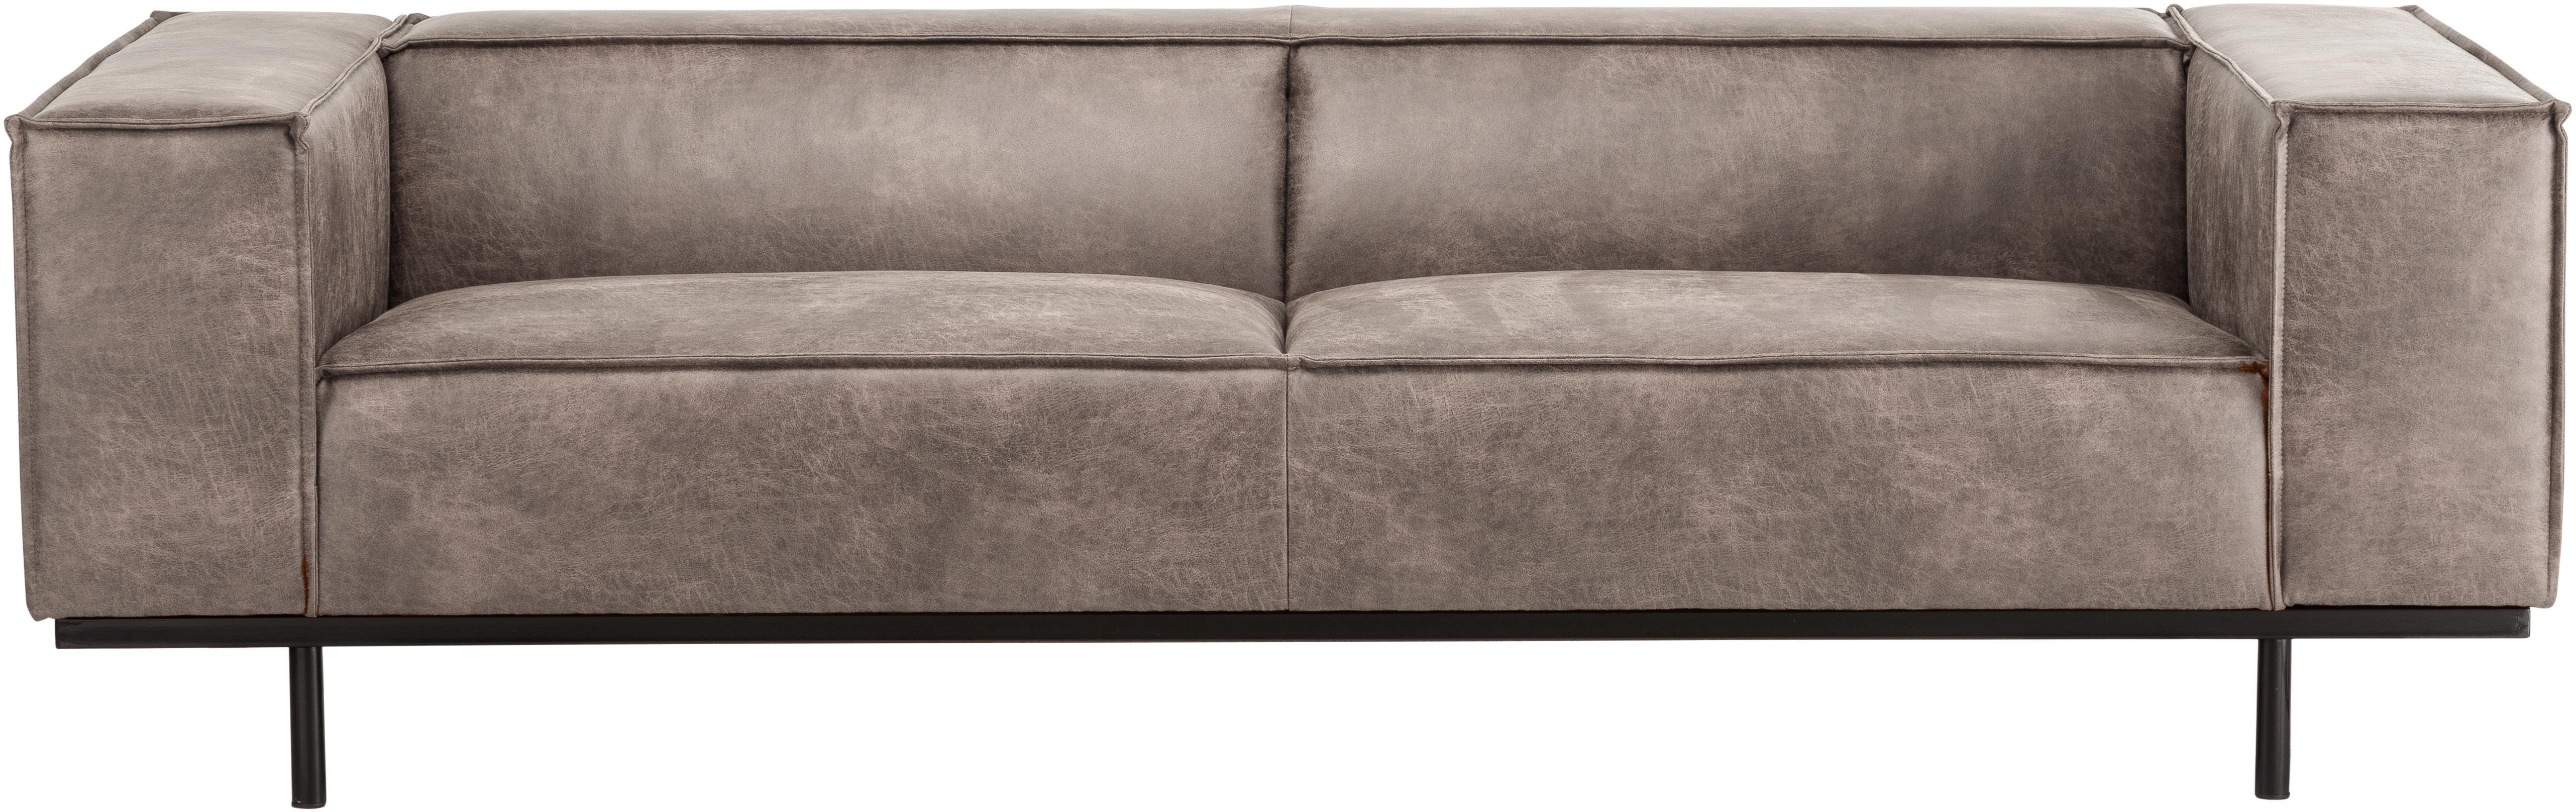 Leder-Sofa Abigail (2-Sitzer), Bezug: Lederfaserstoff (70% Lede, Beine: Stahl, lackiert, Leder Cognac, B 190 x T 95 cm